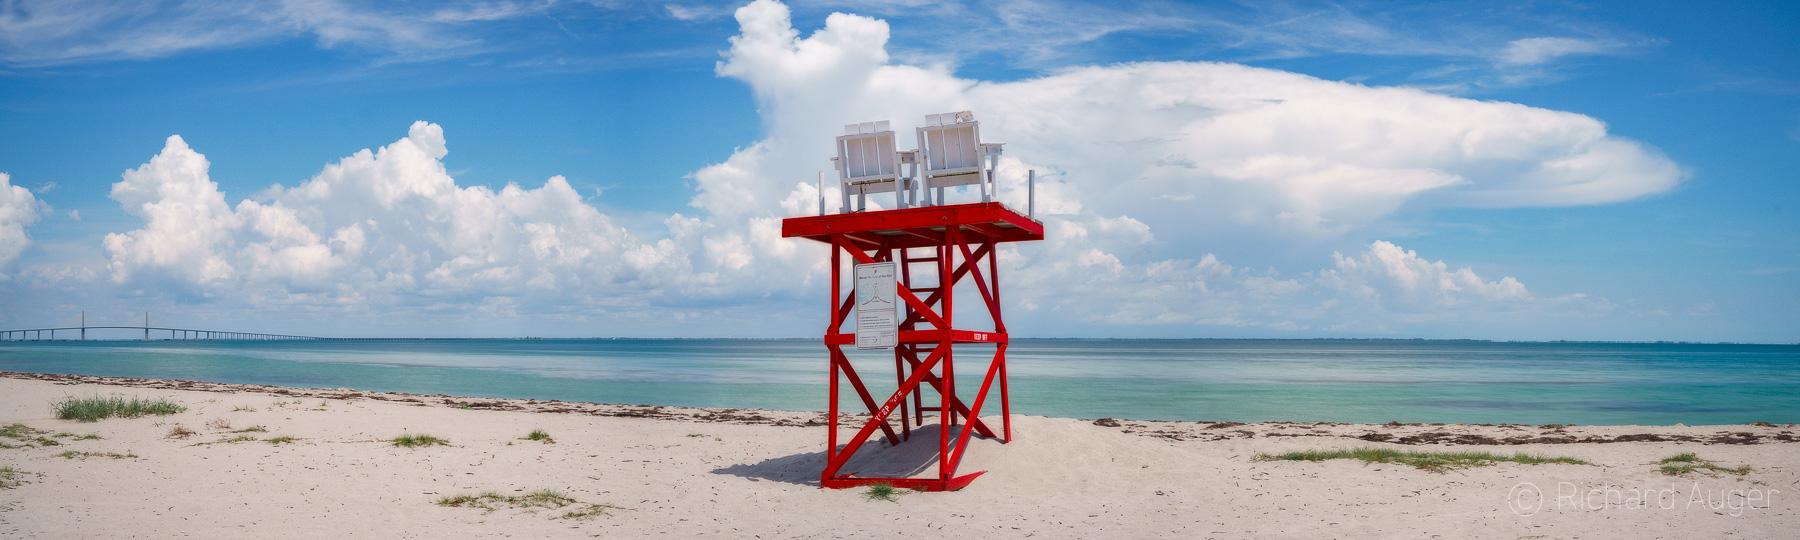 Fort De Soto Park, Florida, Lifeguard, Skyway Bridge, Pinellas County, St Petersburg, Beach, Sand Dunes, Ocean, Blue, Water, Photograph, Photographer, Photo, Landscape, Richard Auger